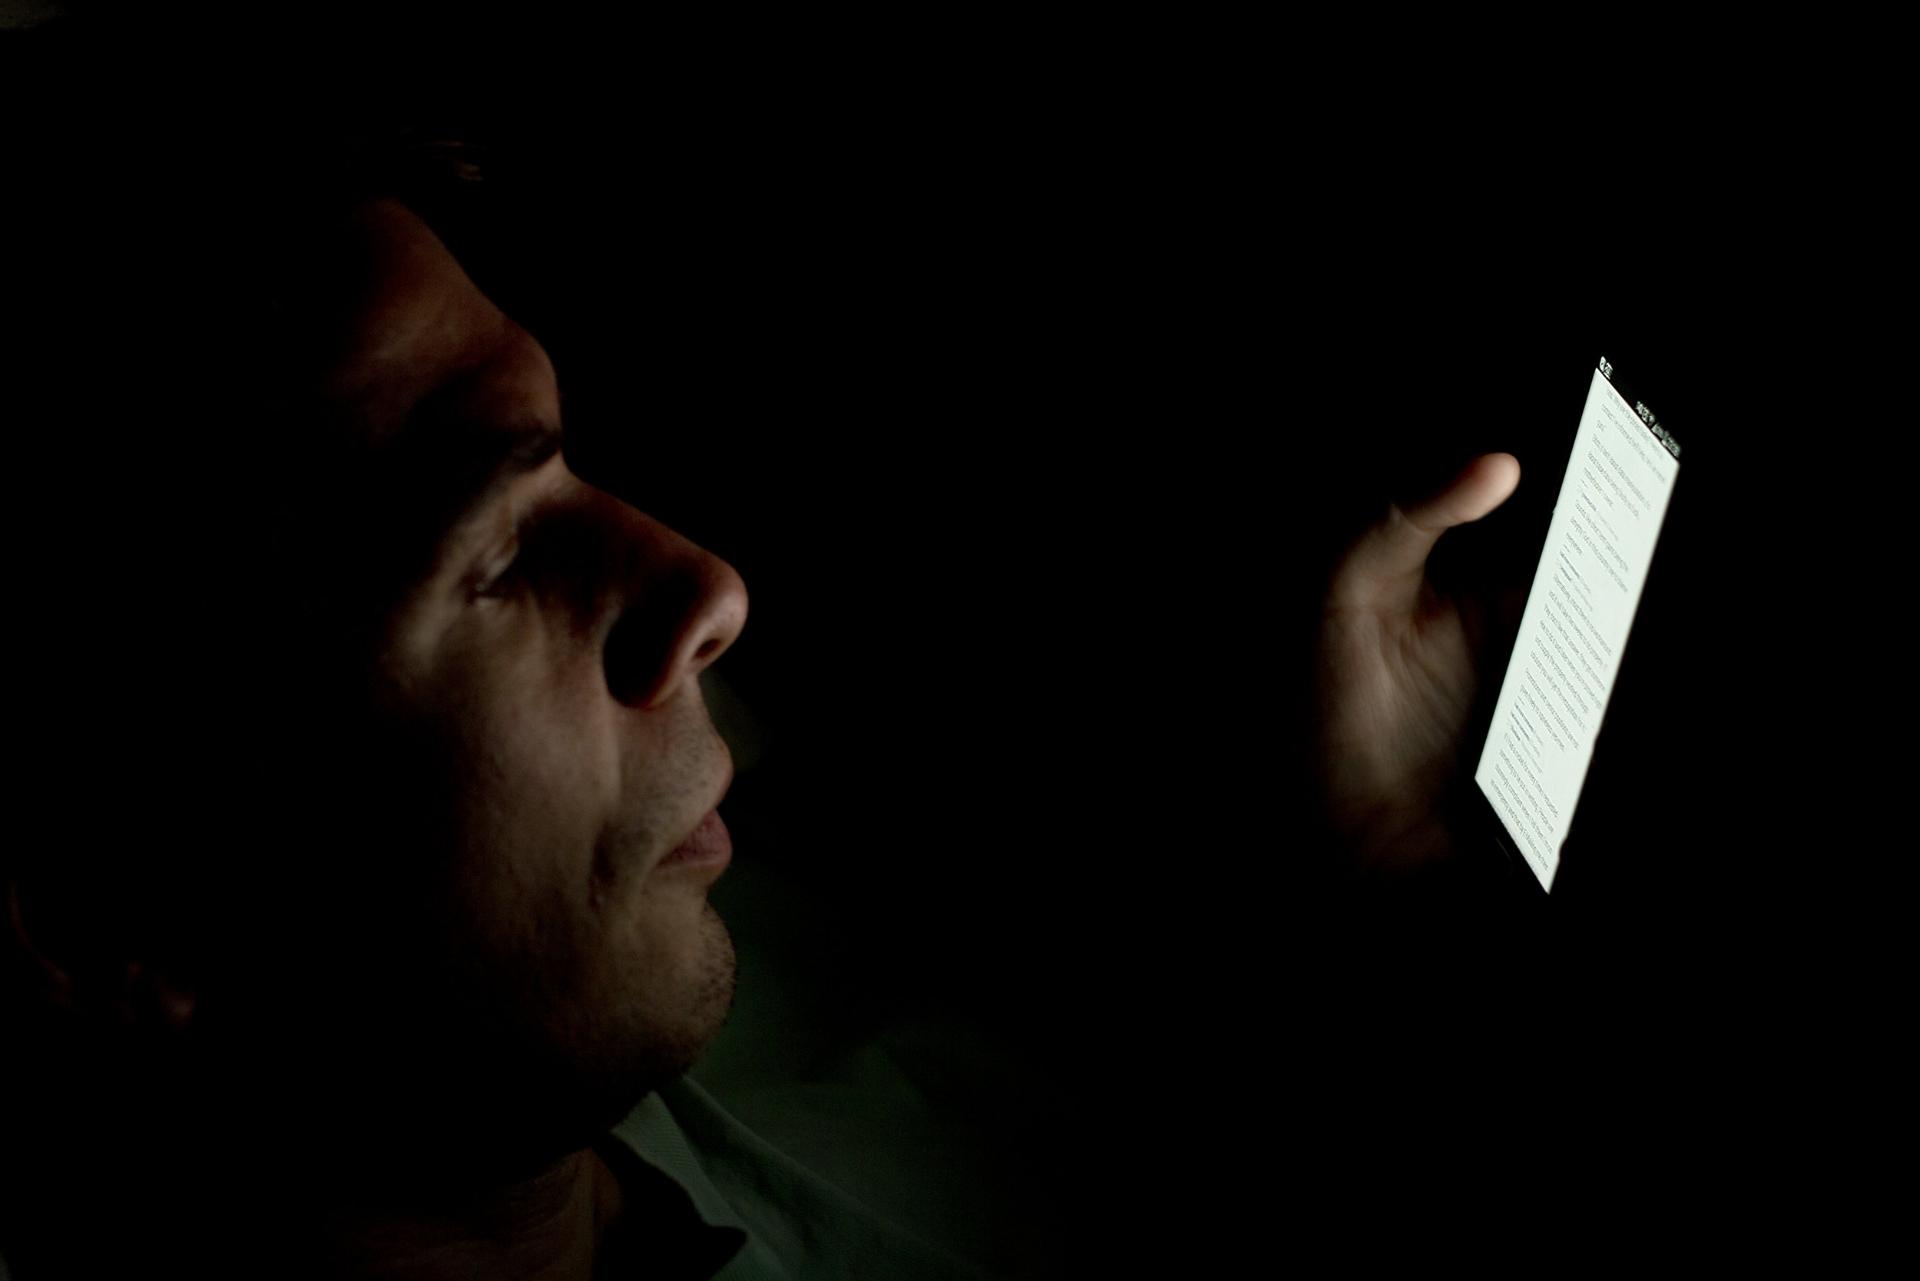 man looking at smartphone in the dark